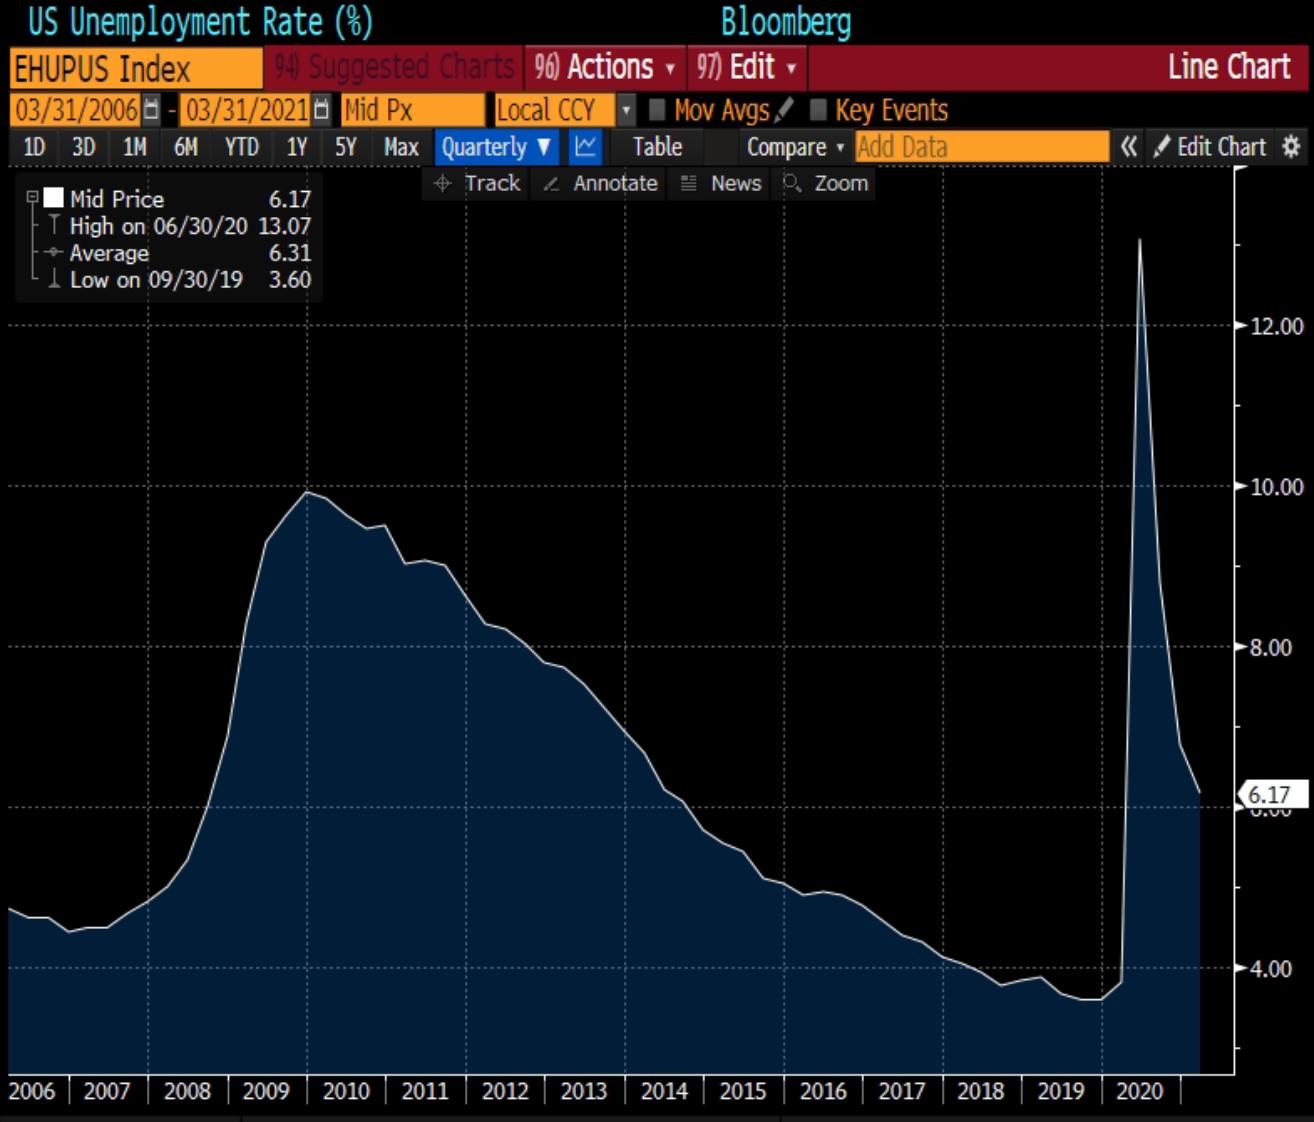 Gráfico apresenta taxa de desemprego americana (Período: 2006 a 2020).